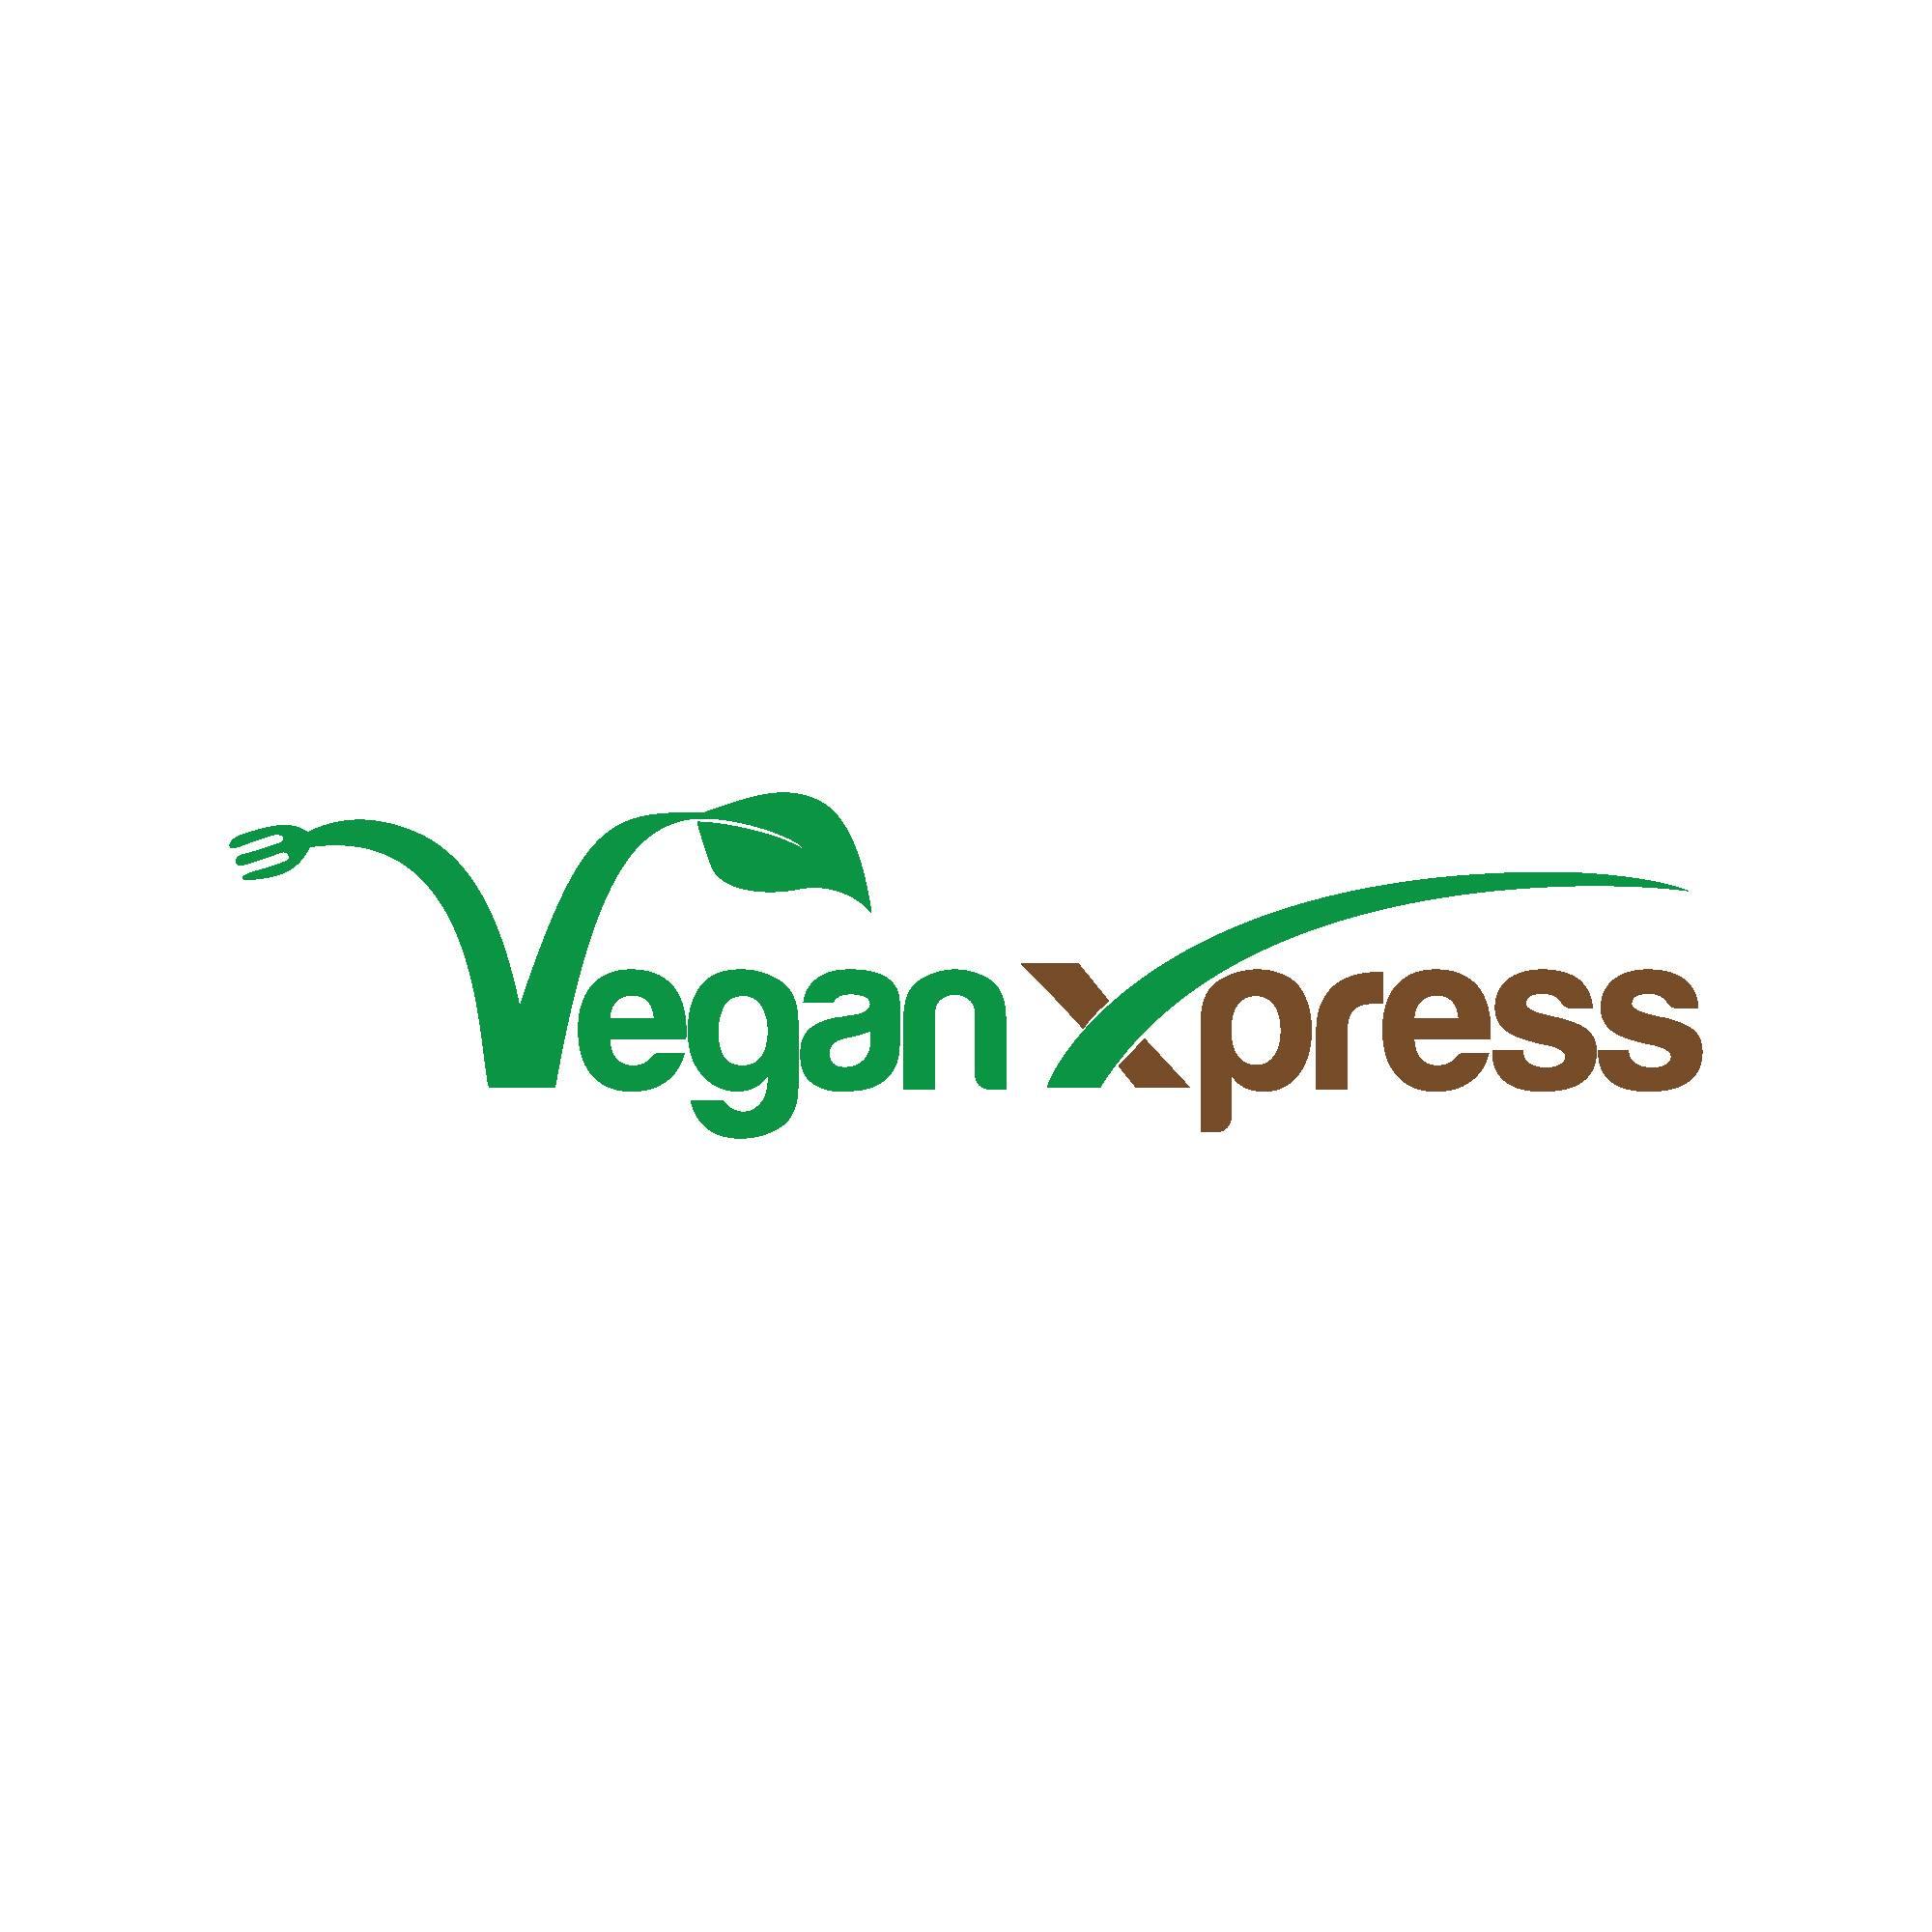 Vegan Xpress